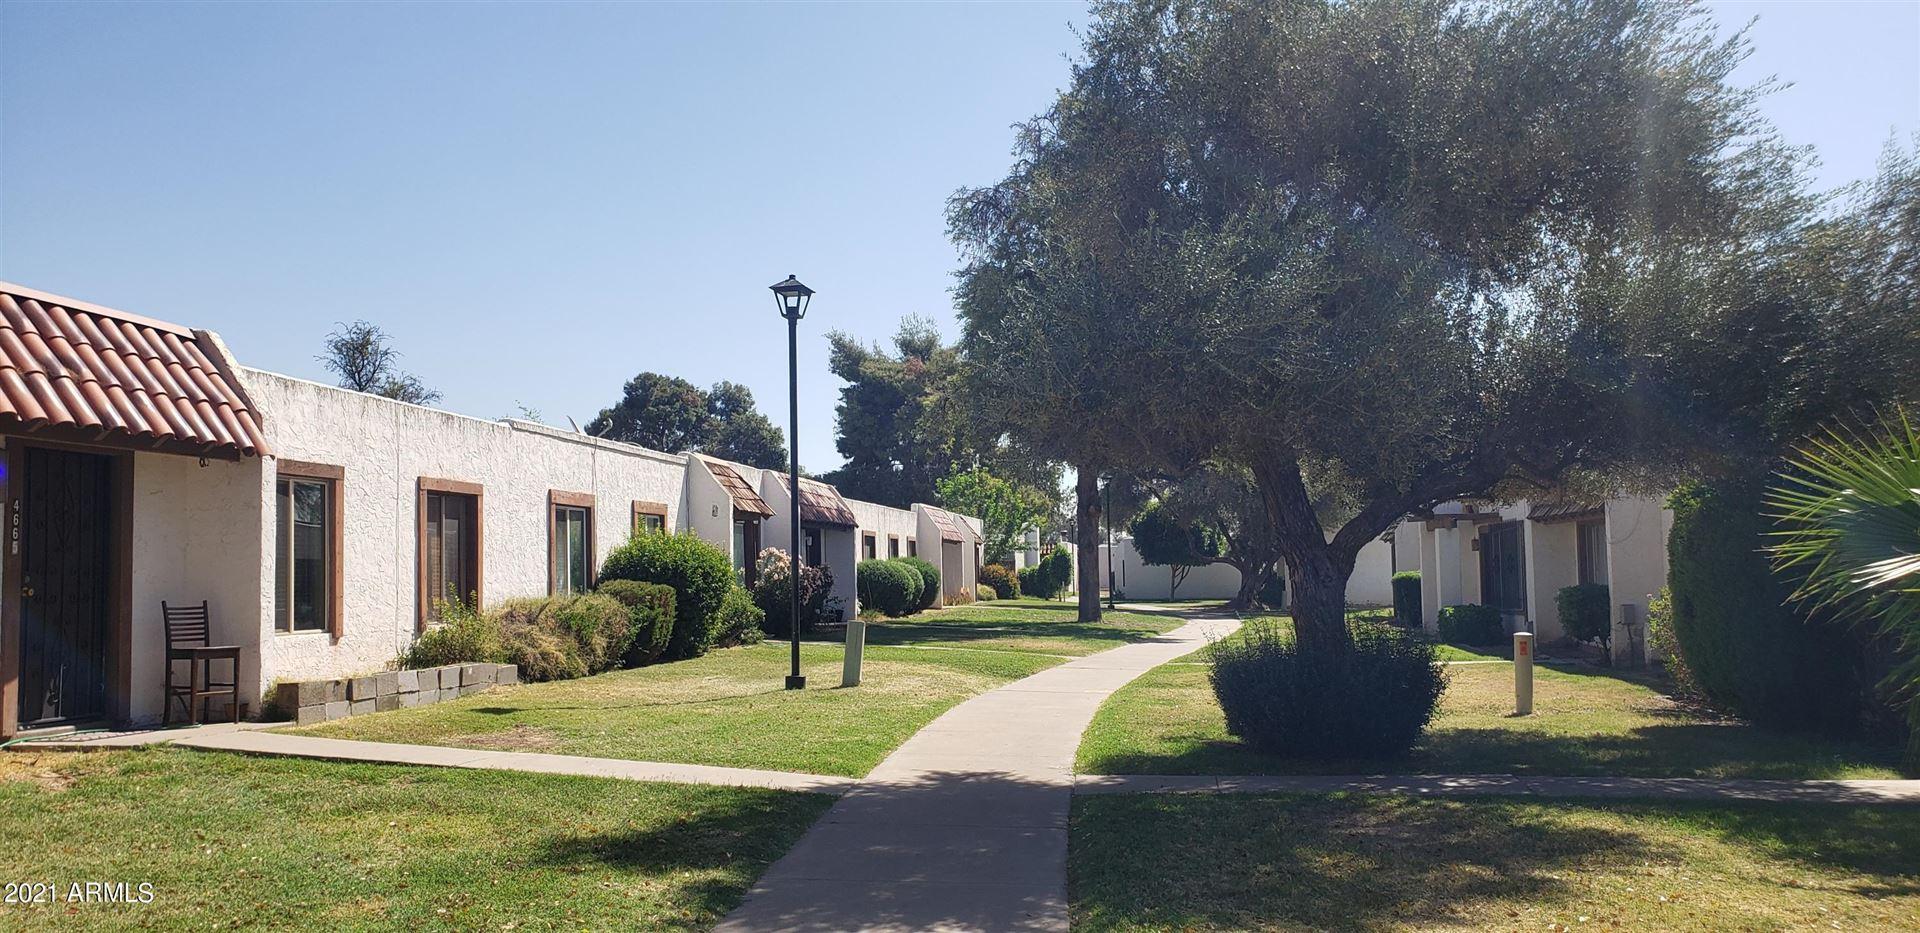 Photo of 4661 W DESERT CREST Drive, Glendale, AZ 85301 (MLS # 6234065)